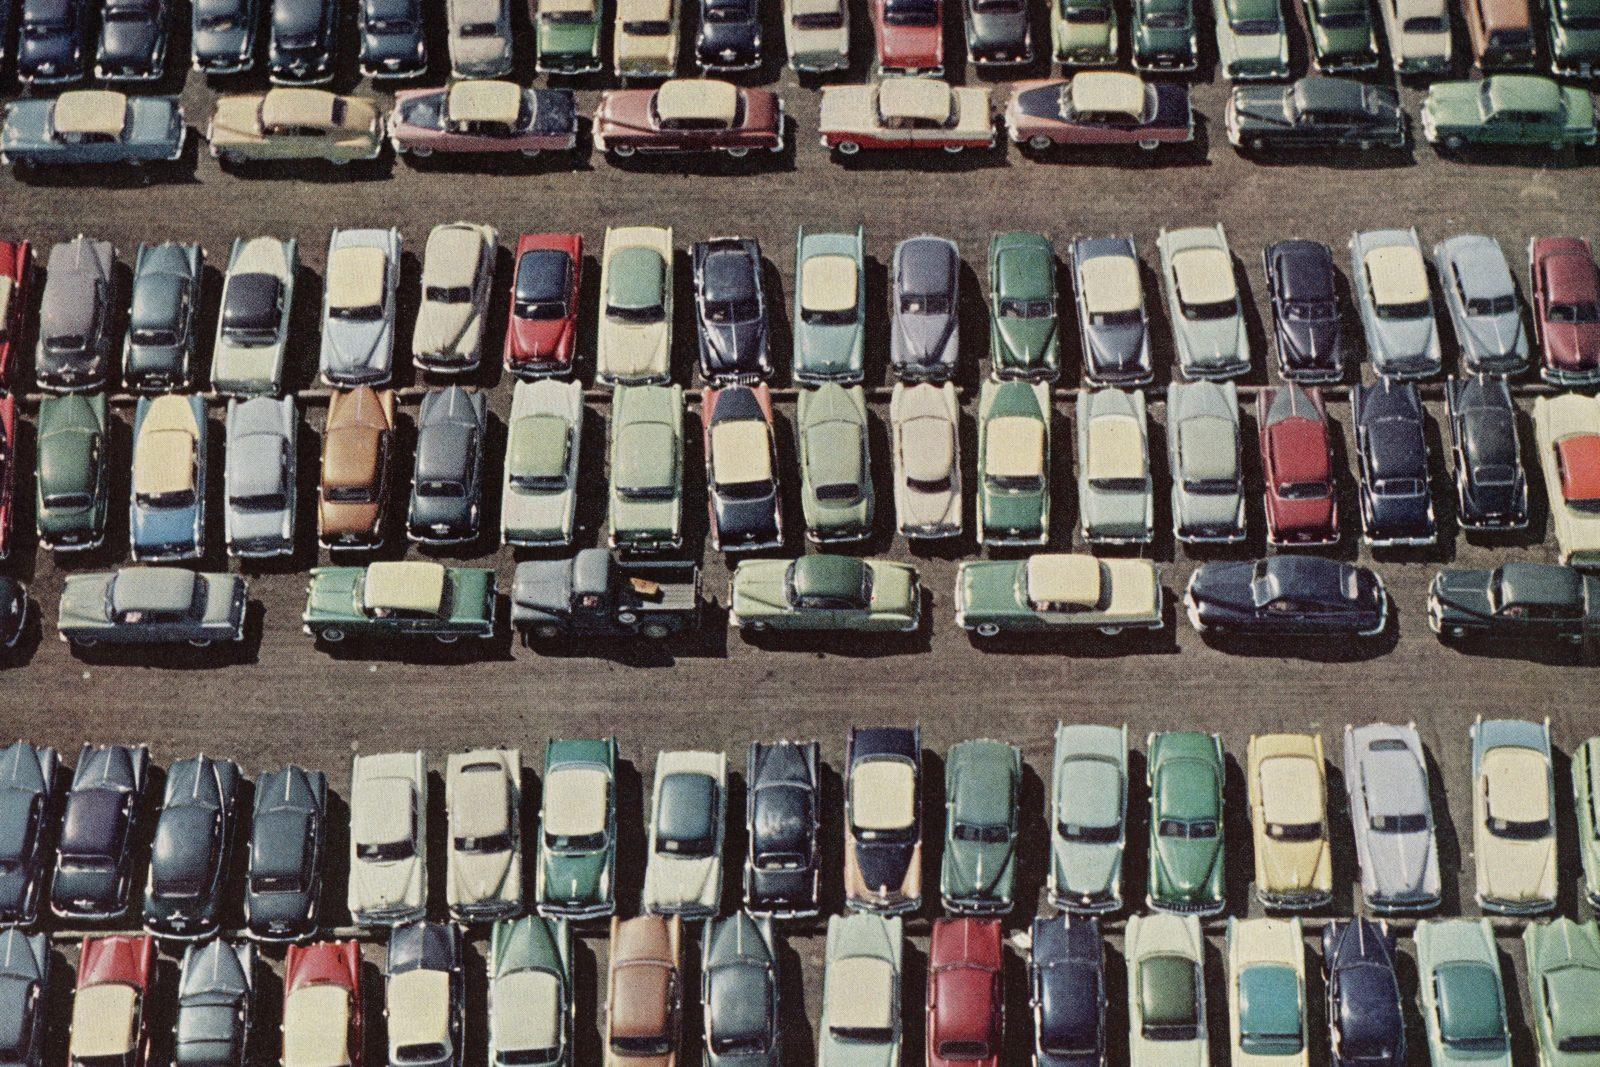 Event Parking 101